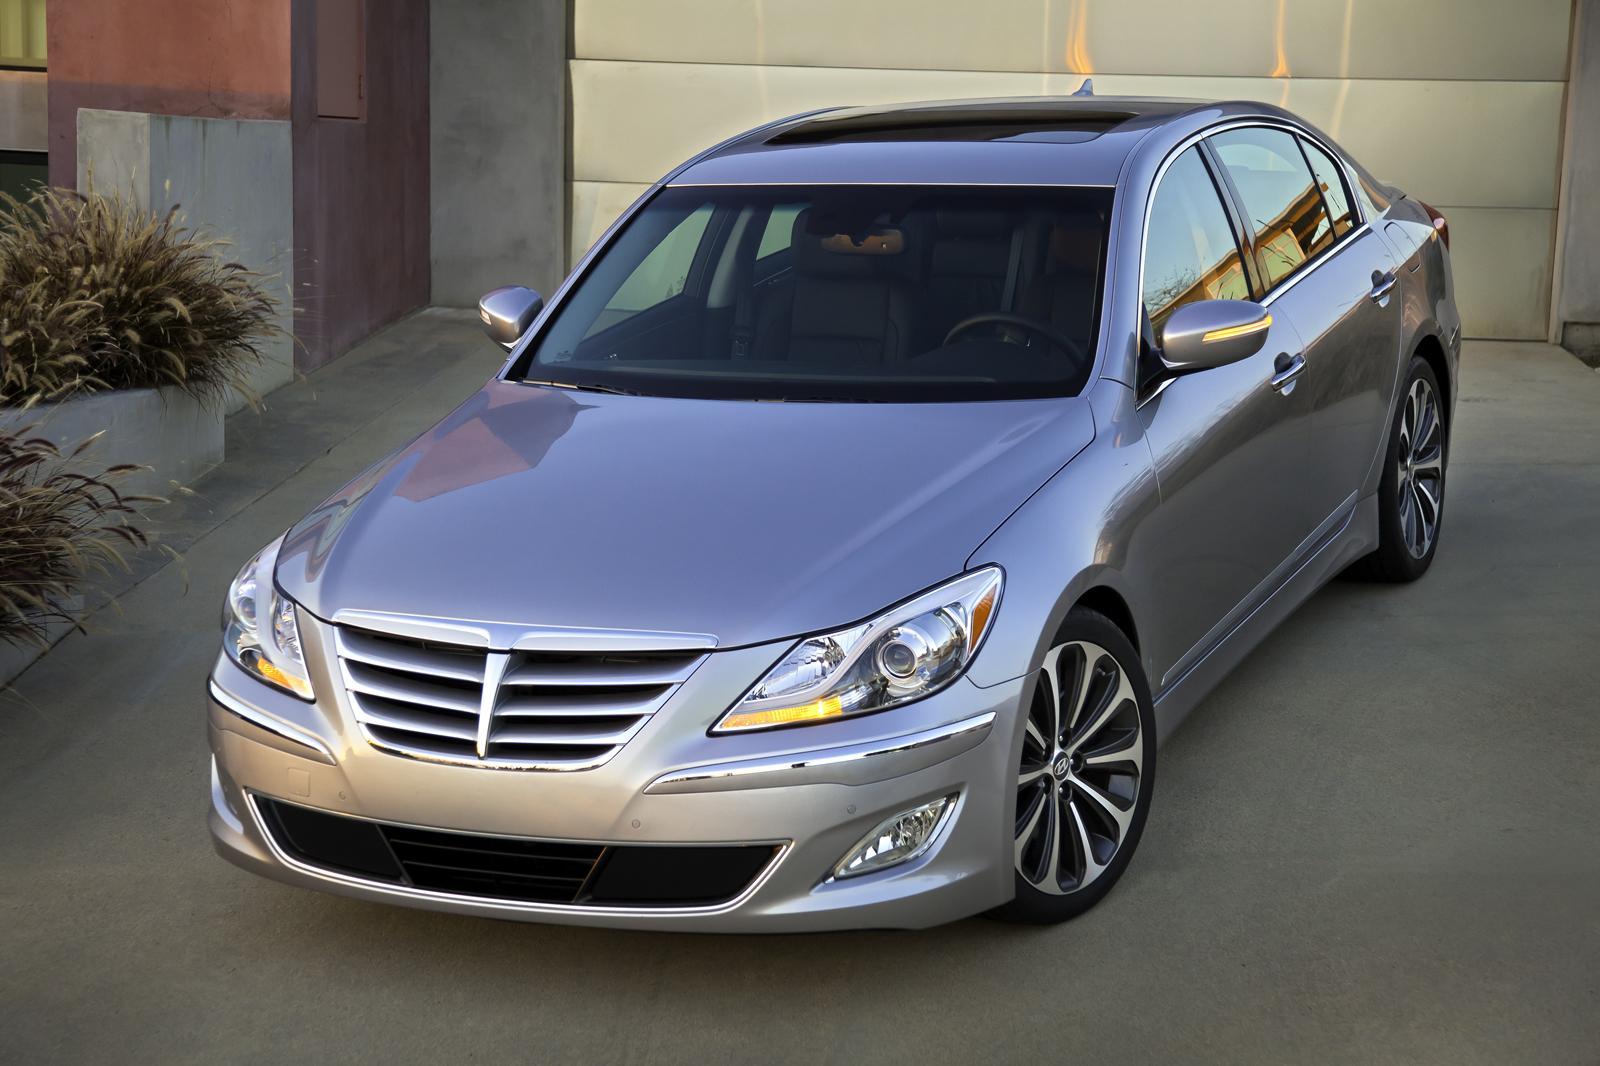 2014 Nissan Versa Note Us Price 13 990